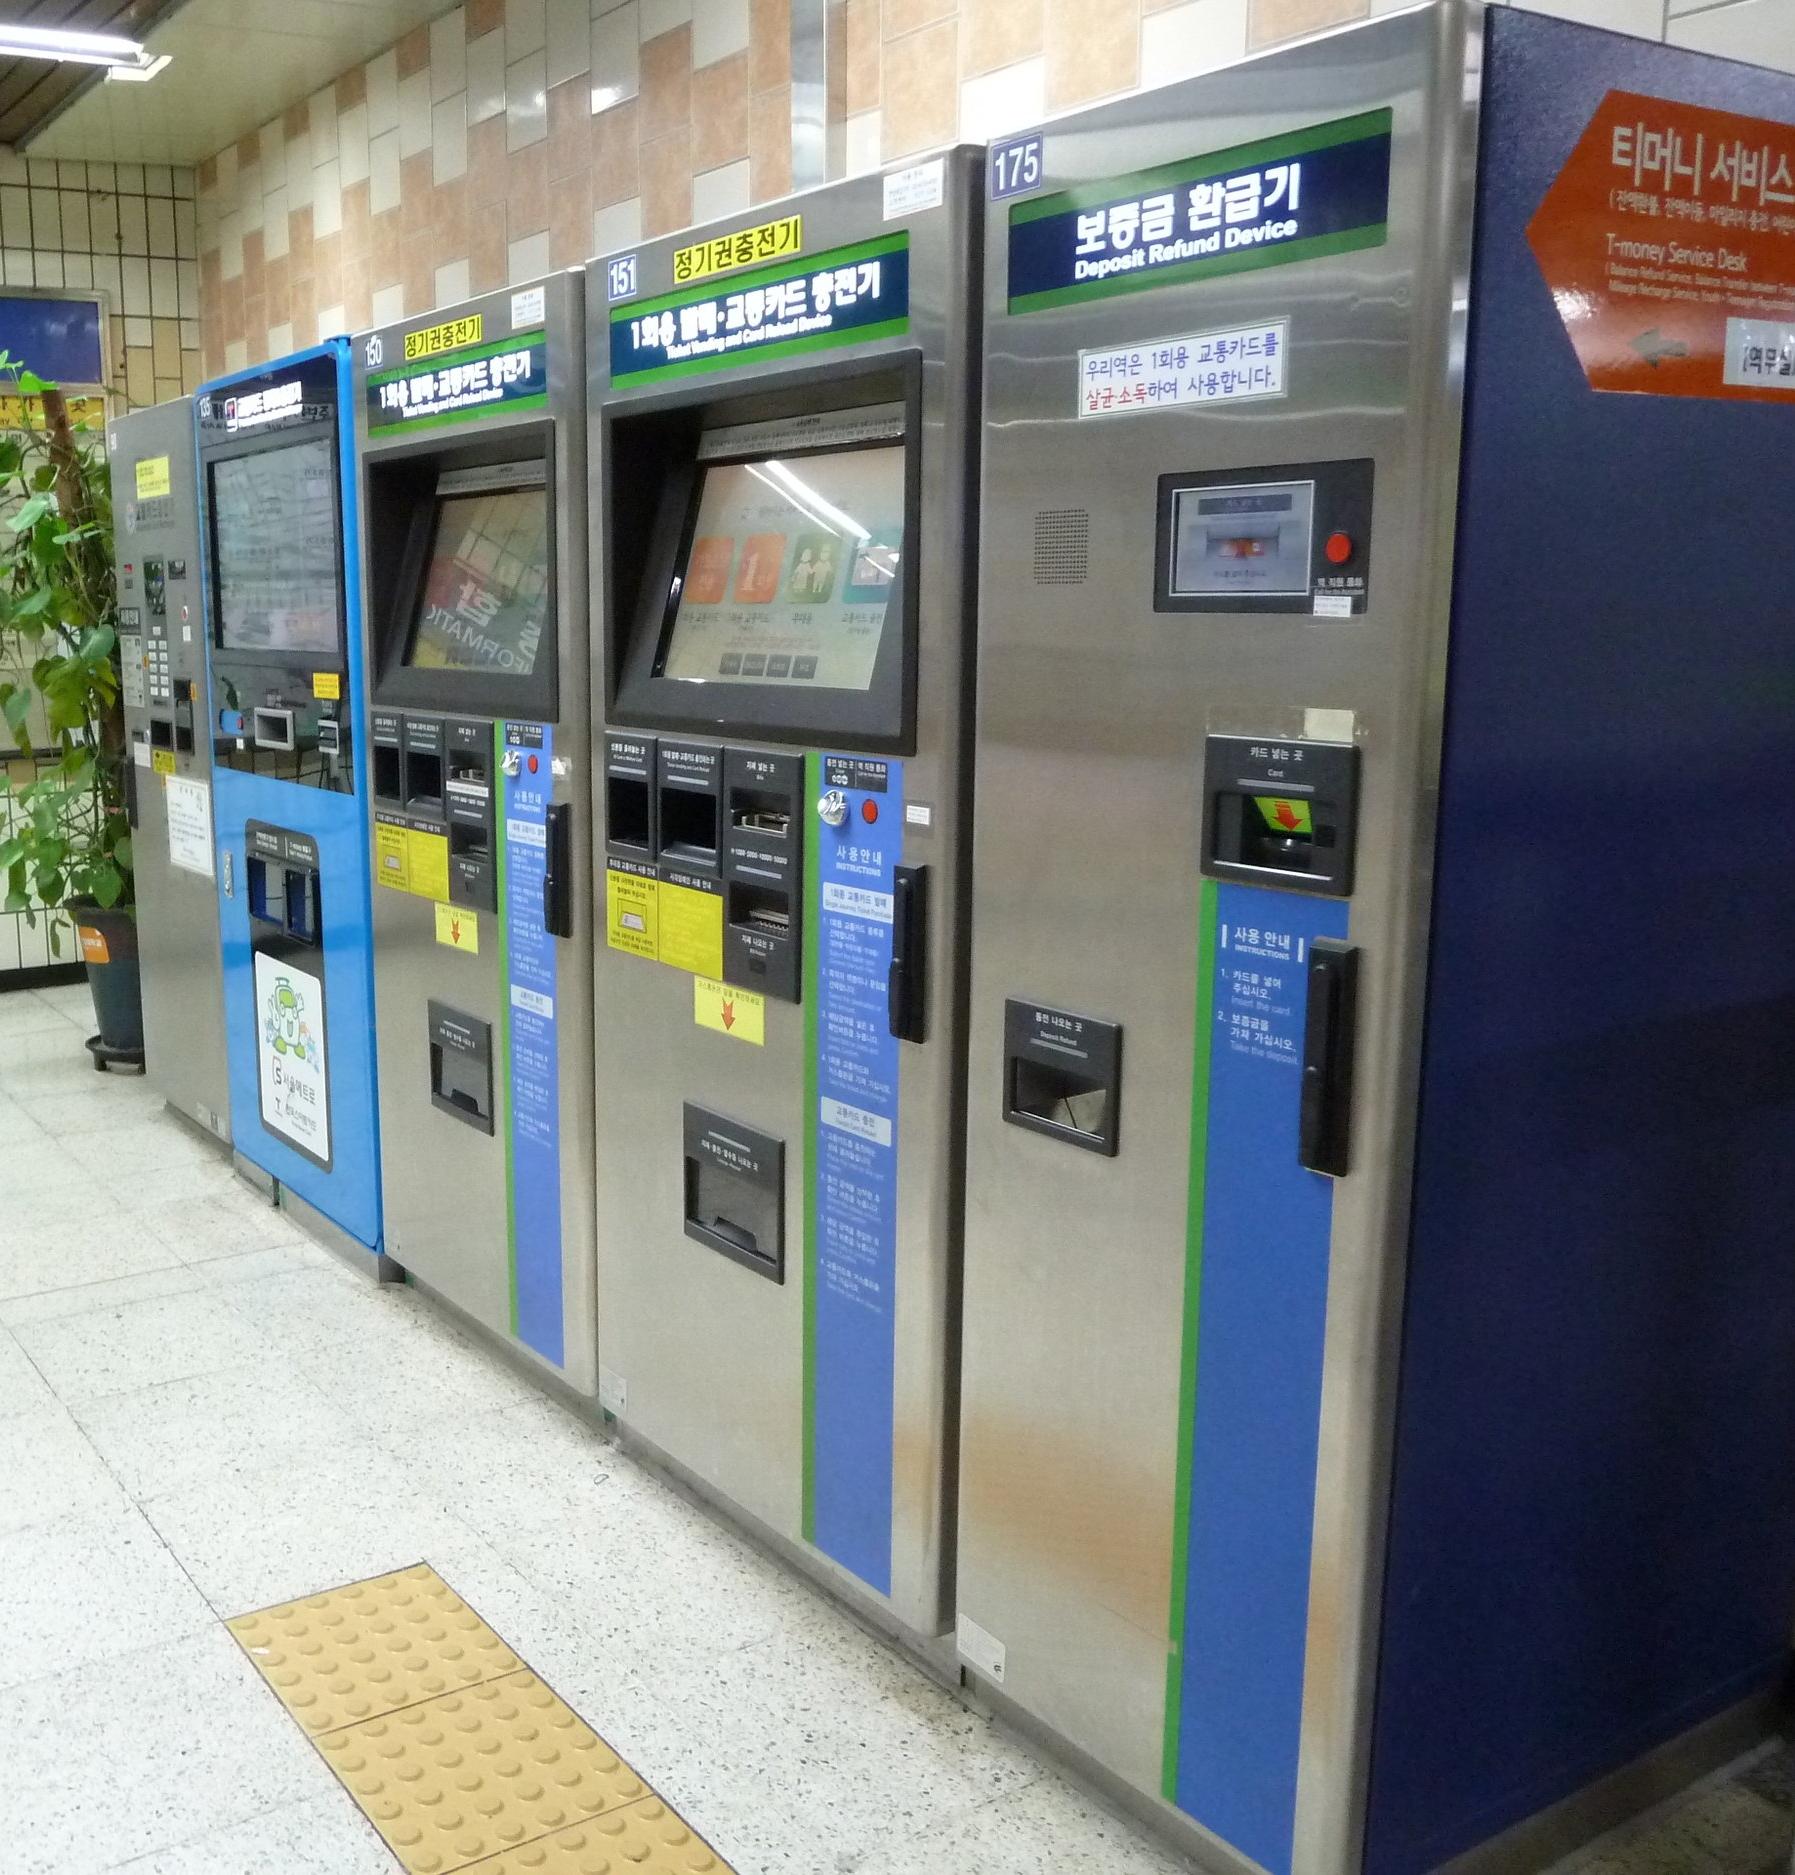 how-to-get-t-money-card-seoul-metro.jpg